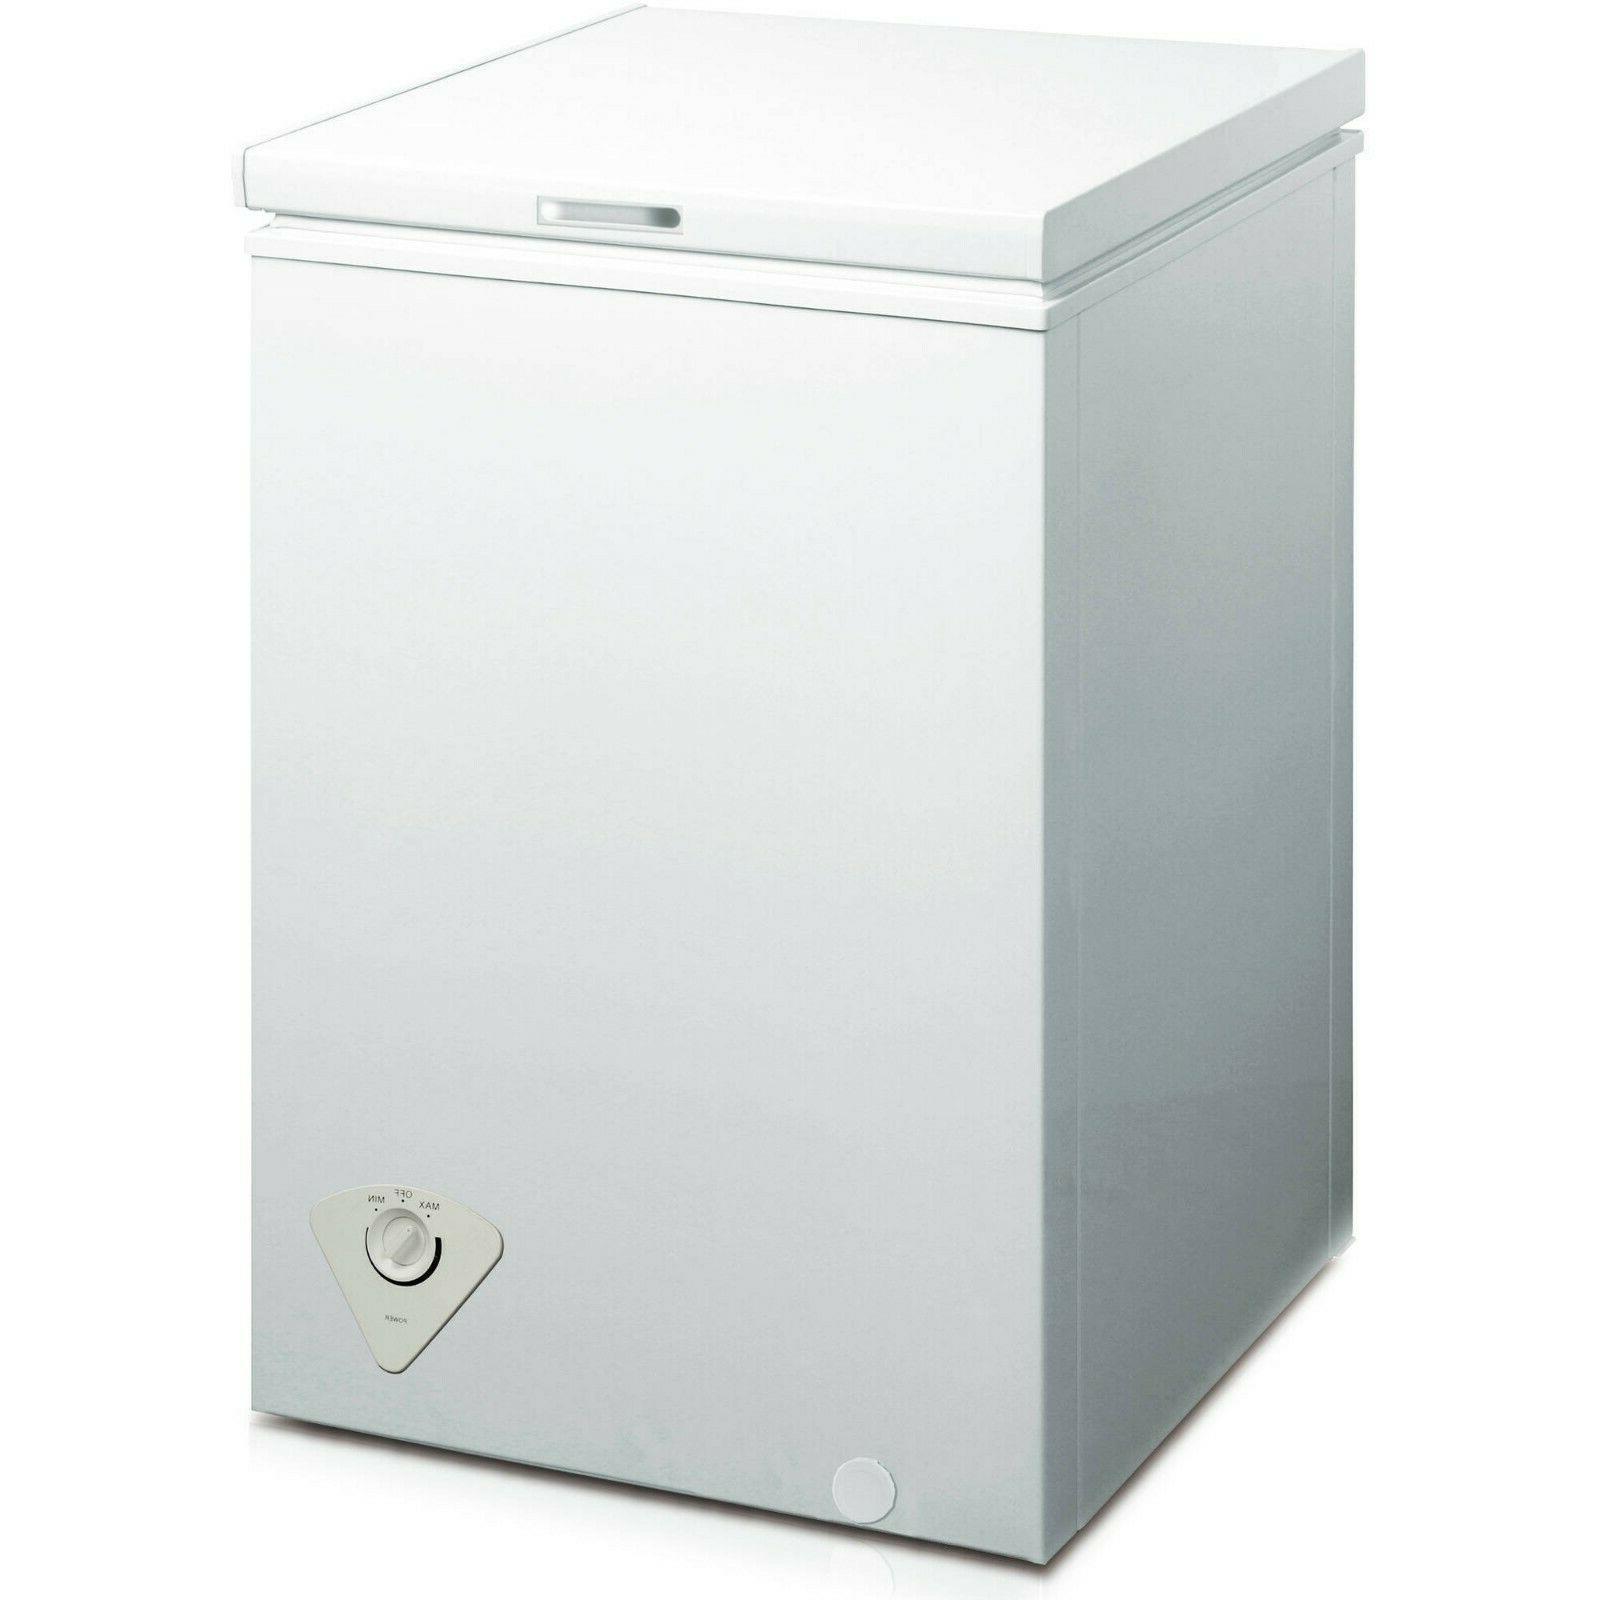 Chest Freezer Storage Ice Deep Freeze 3.5 Cu Ft Quick Defros